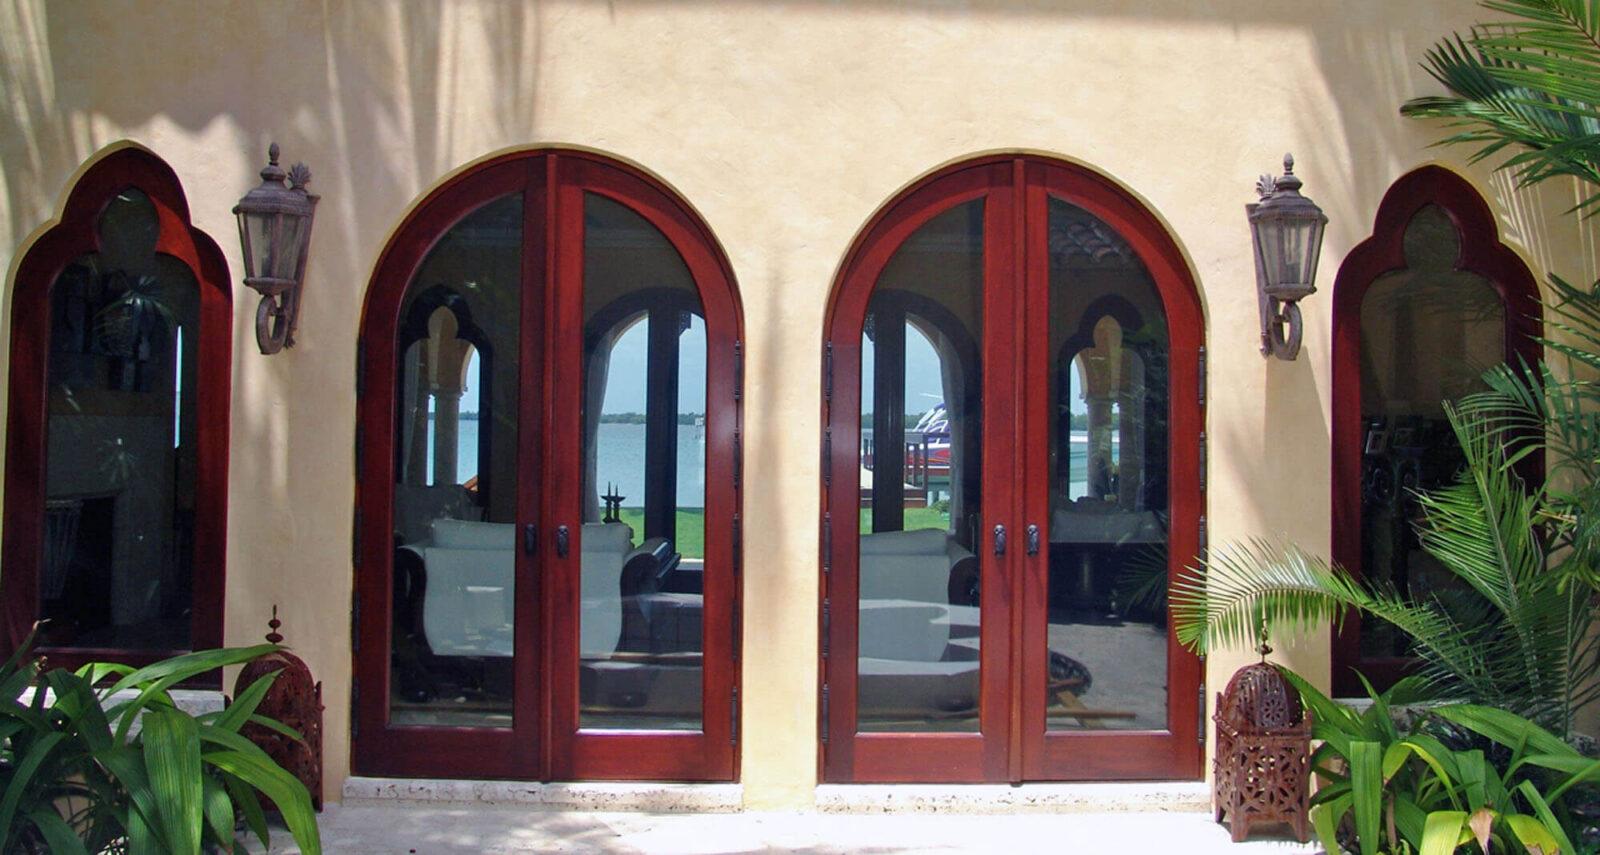 SUNSET ISLAND DOORS AND WINDOWS.